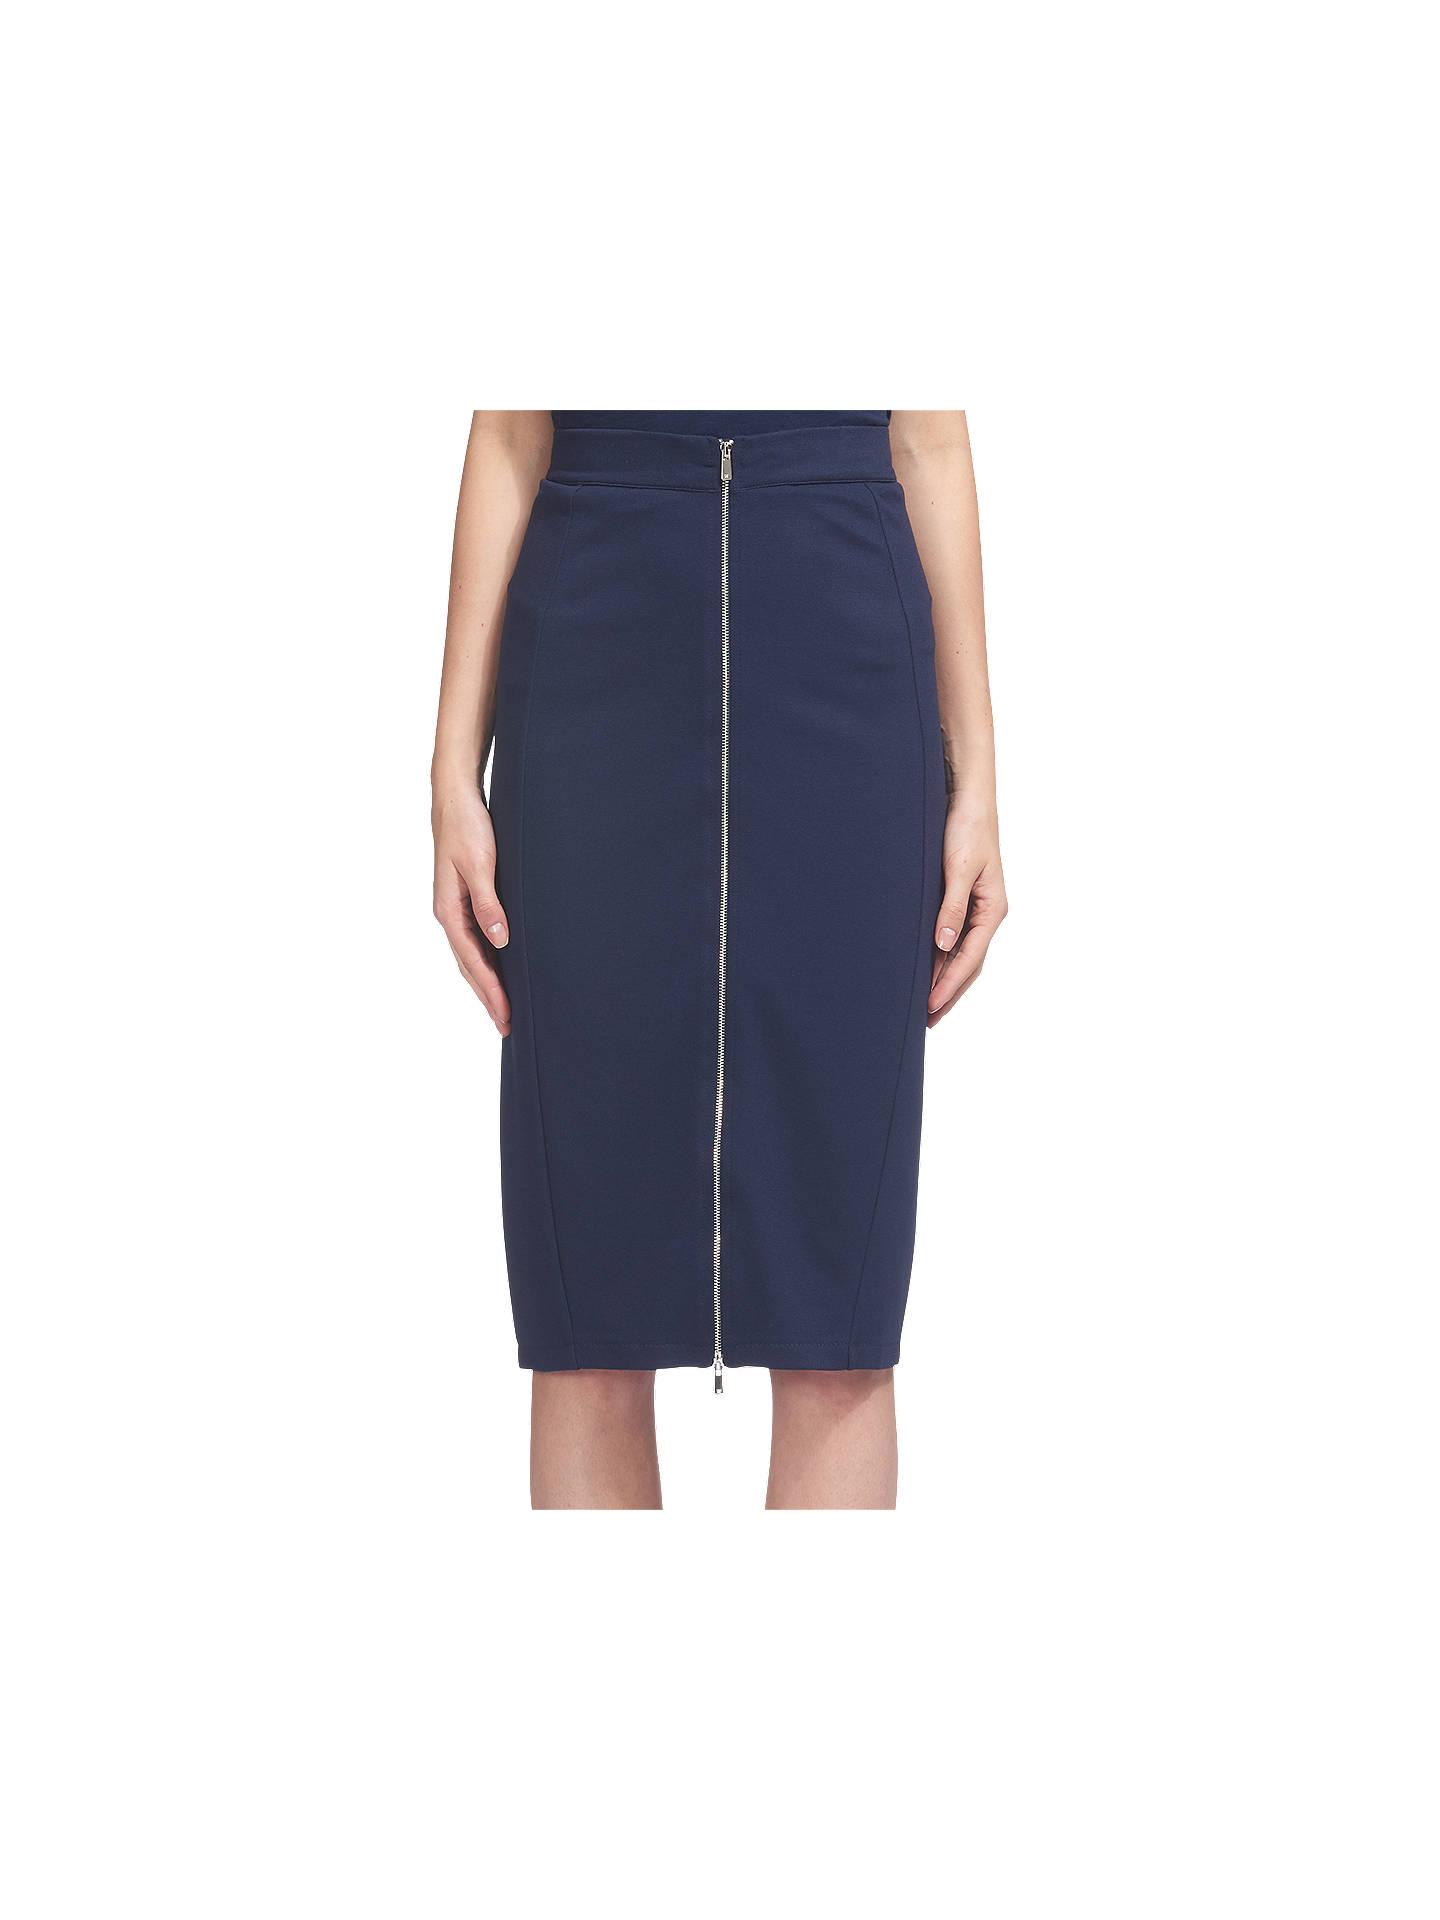 aef8cd5bf1 Buy Whistles Jersey Zip Tube Skirt, Navy, 6 Online at johnlewis.com